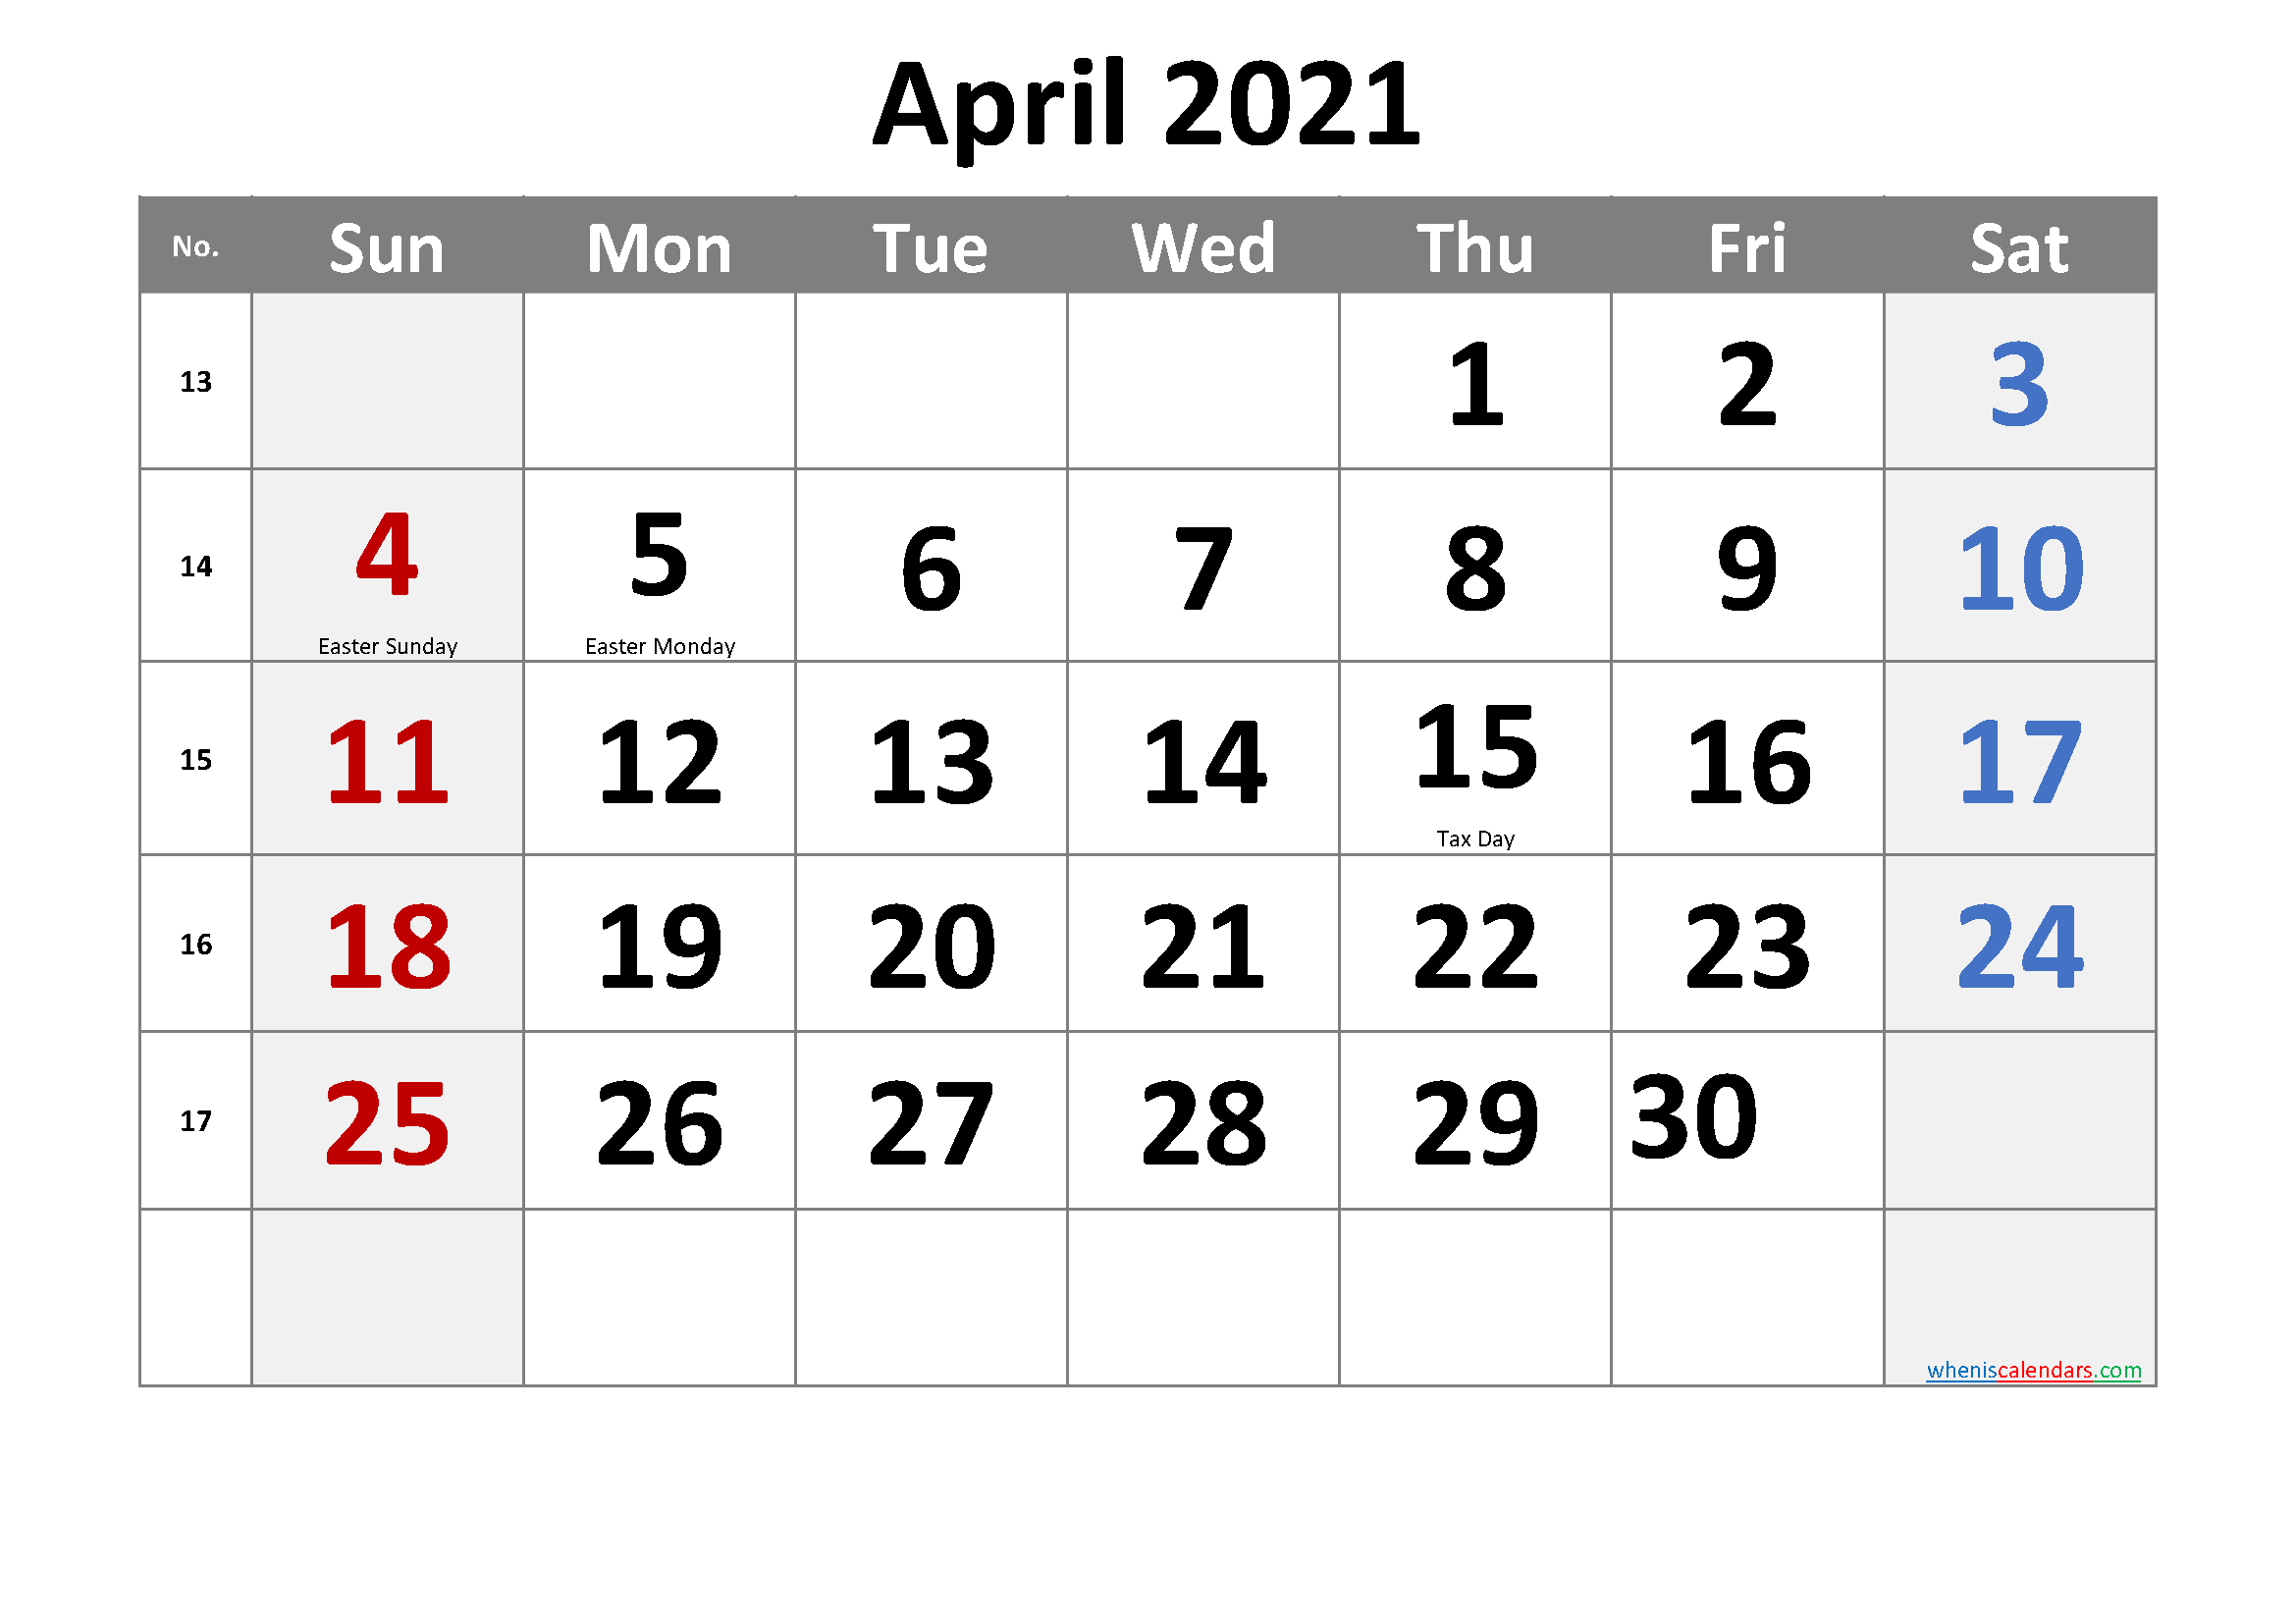 APRIL 2021 Printable Calendar with Holidays